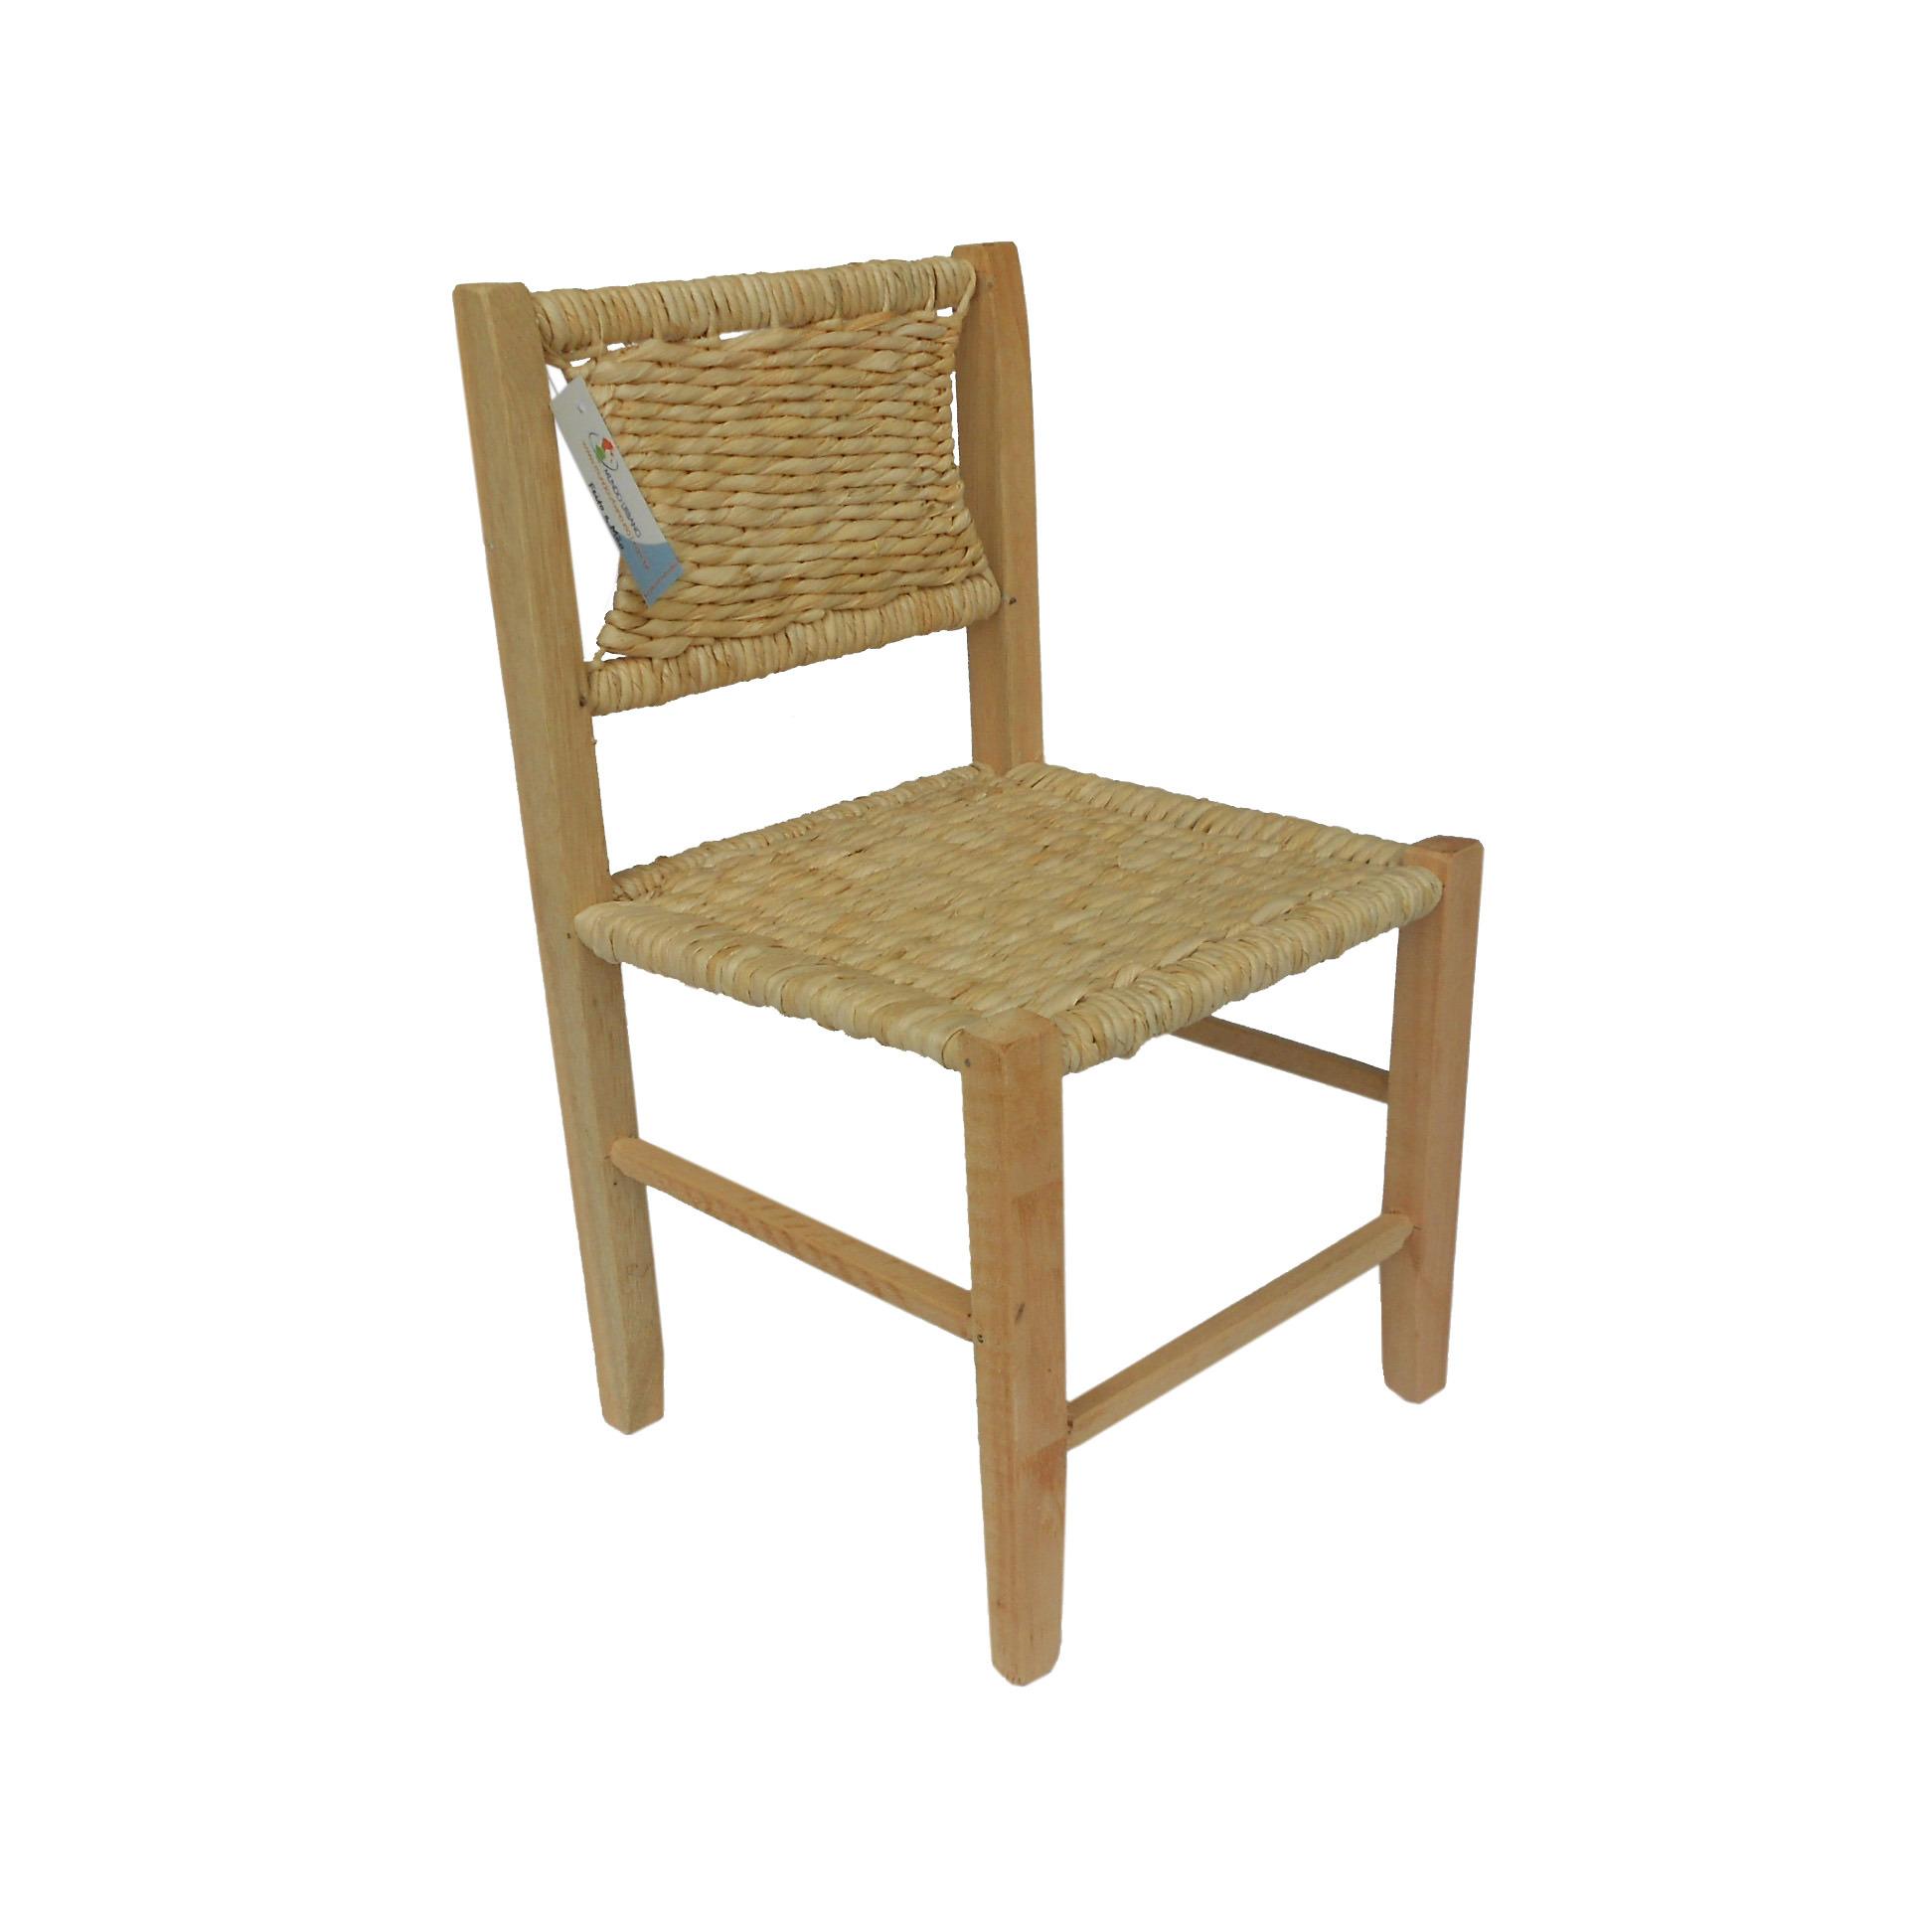 Cadeira Infantil Palha Milho Nt 30x30x54 Cadeira Infantil Palha Milho  #70502C 1932x1944